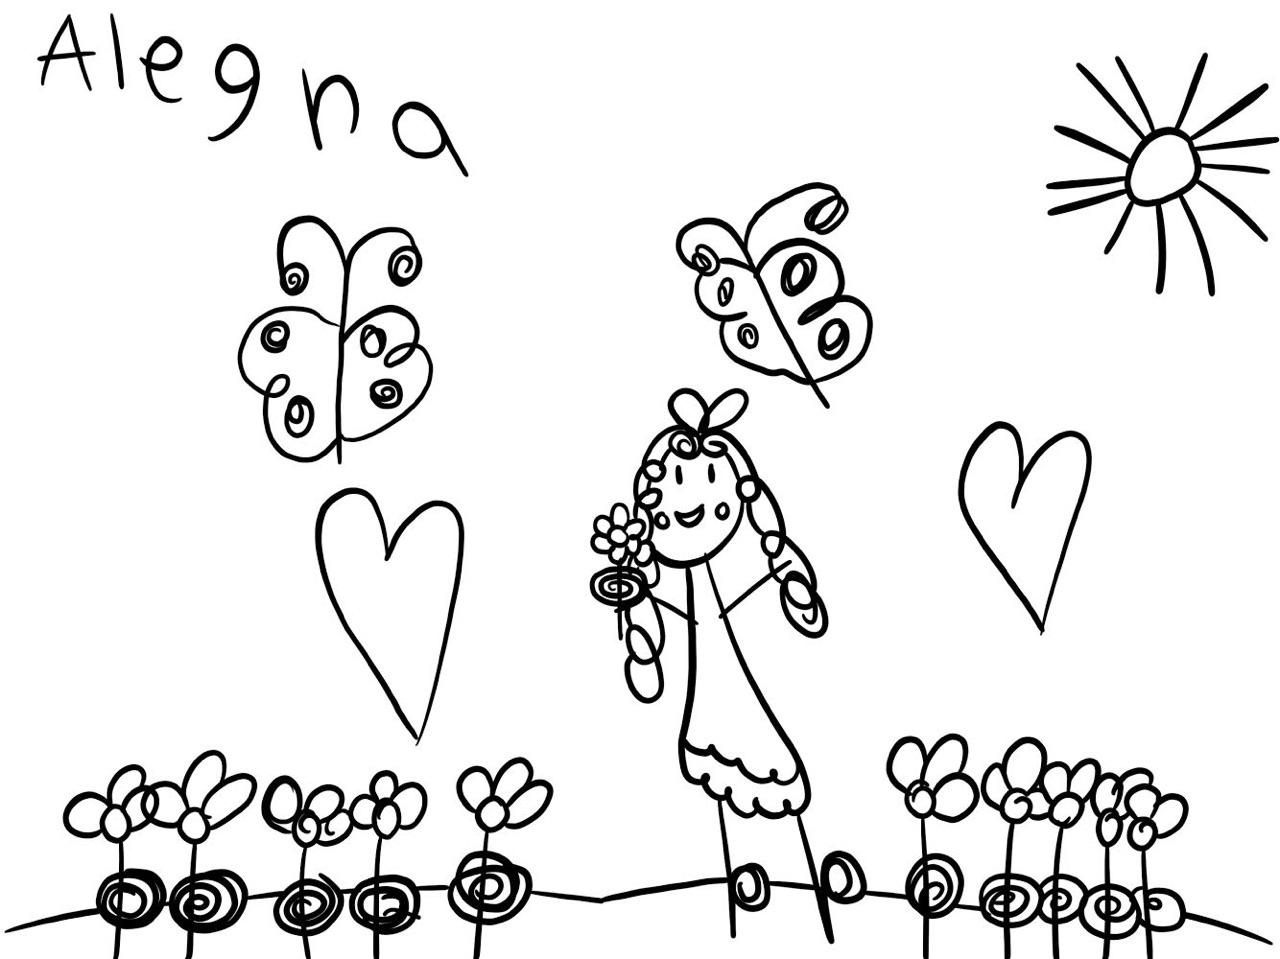 Alegras Drawing